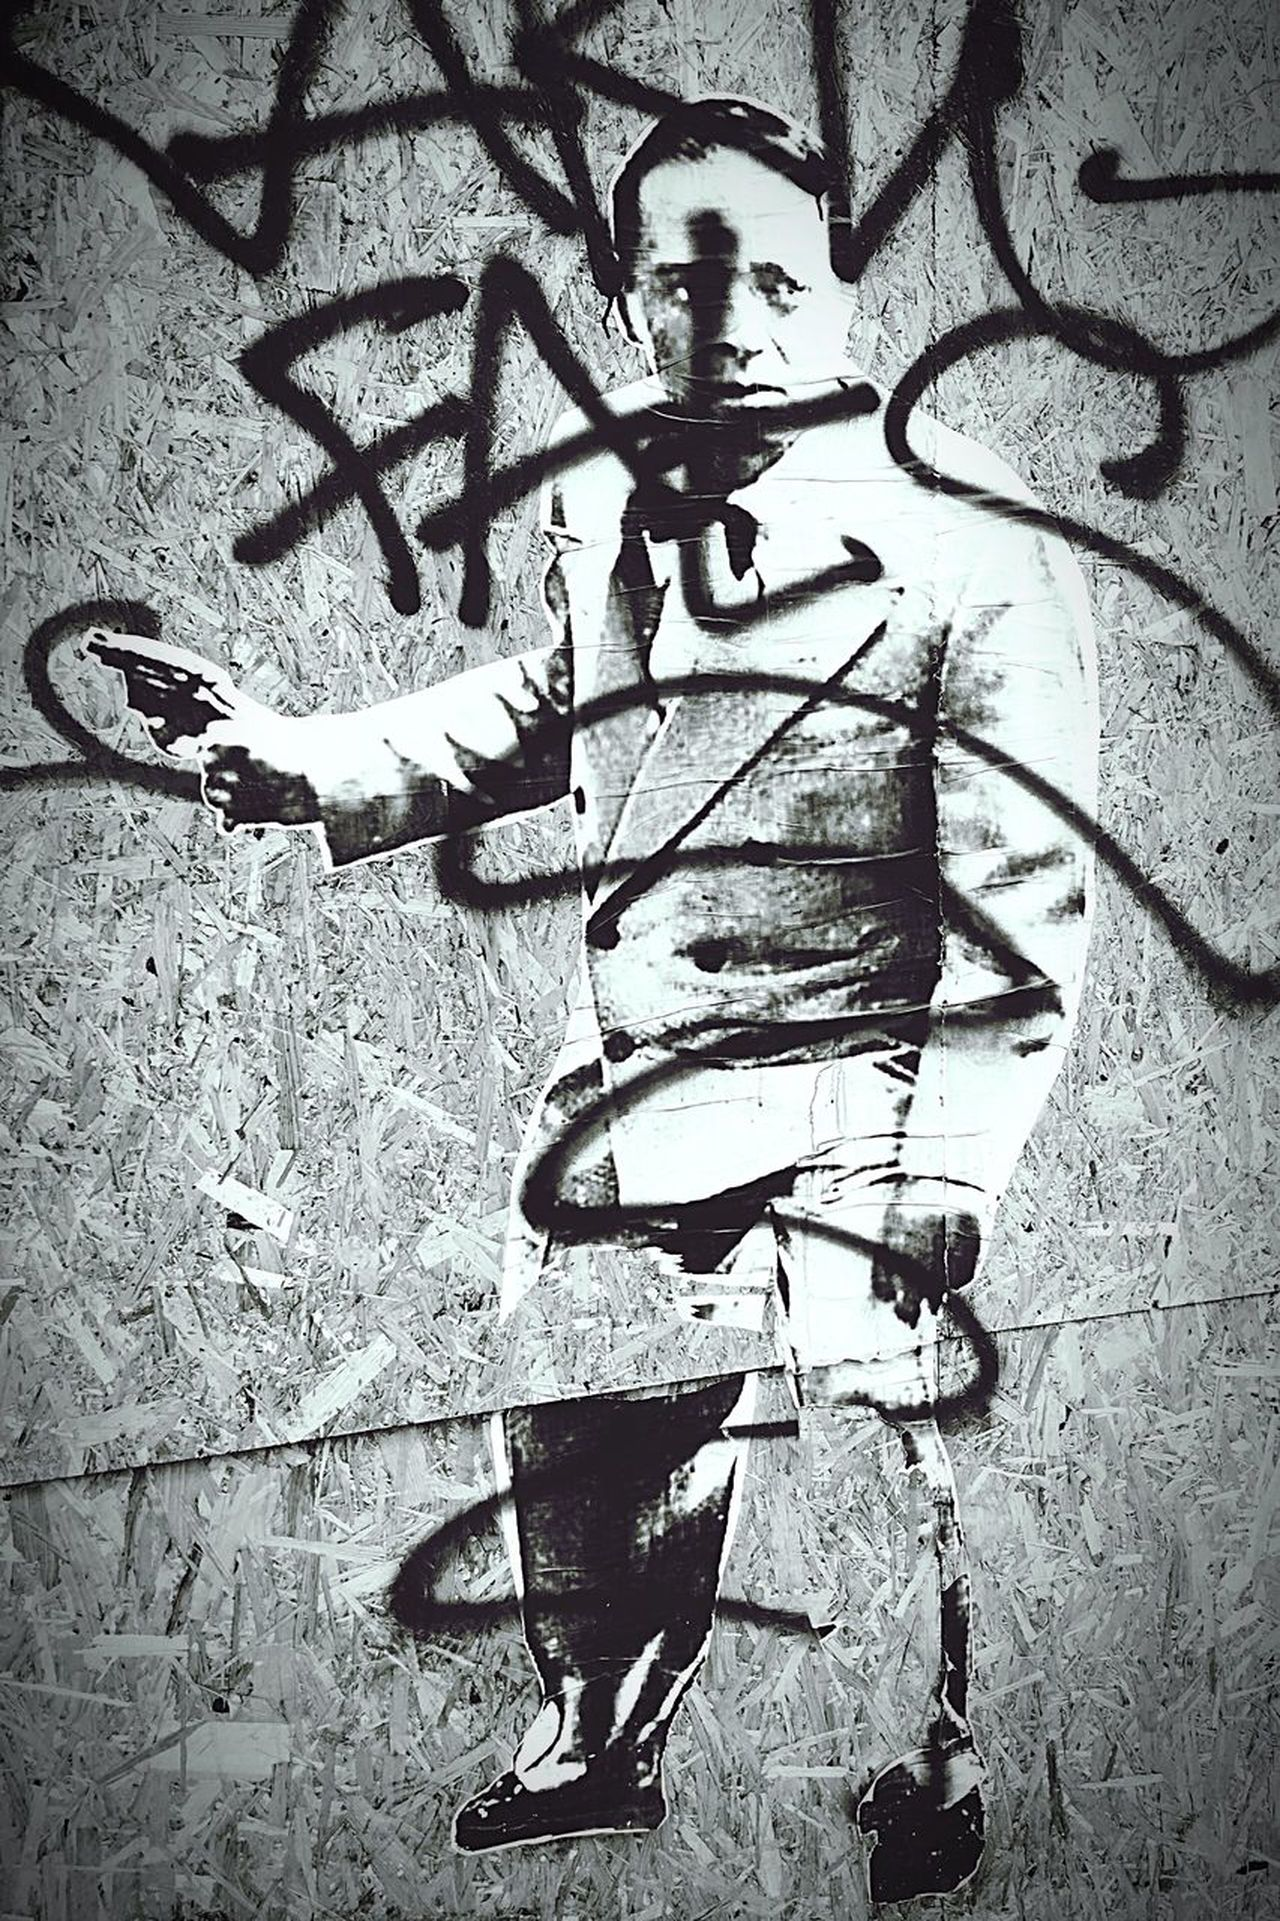 No People Dressed Up Sticker Big Wall Stonegraphix Estetic Smoking Gun Close-up Day Homme Moderne Noir Et Blanc Black And White Blanc Et Noir The Portraitist - 2017 EyeEm Awards EyeEmNewHere The Street Photographer - 2017 EyeEm Awards BYOPaper!